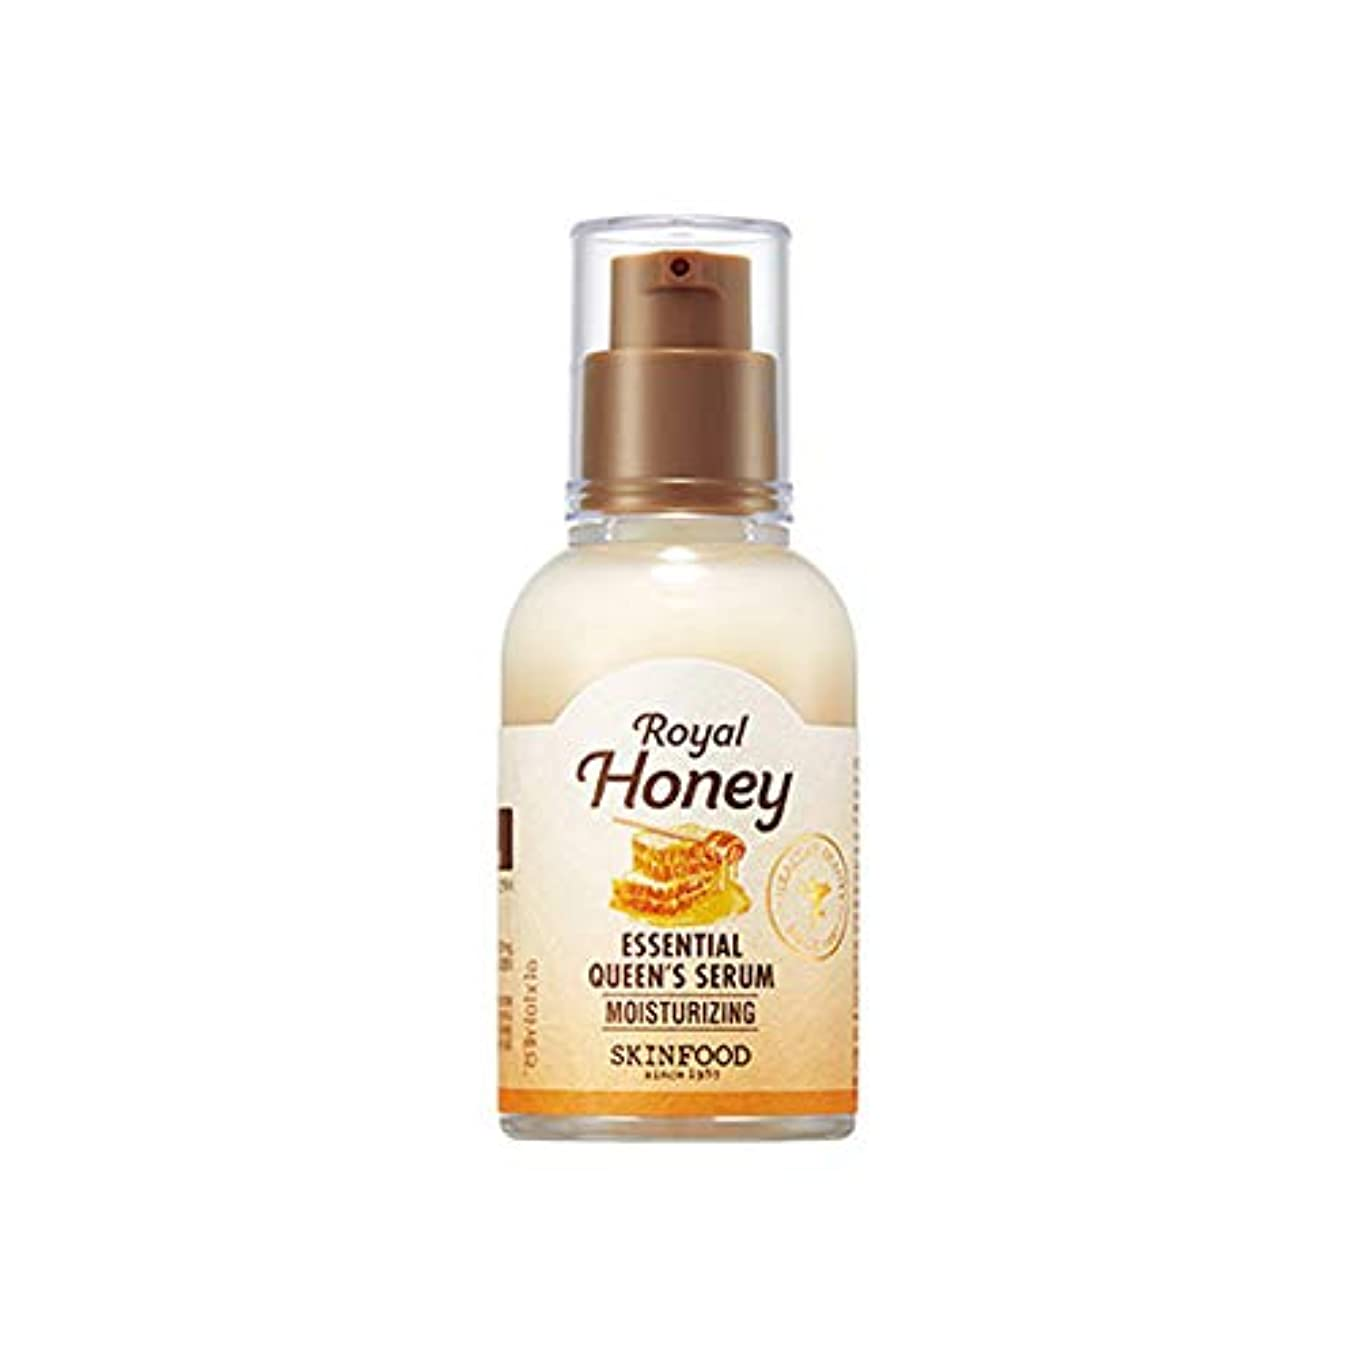 Skinfood Royal Honey Essential Queen's Serum/ロイヤルハニーエッセンシャルオイルクイーンズ血清/50ml [並行輸入品]